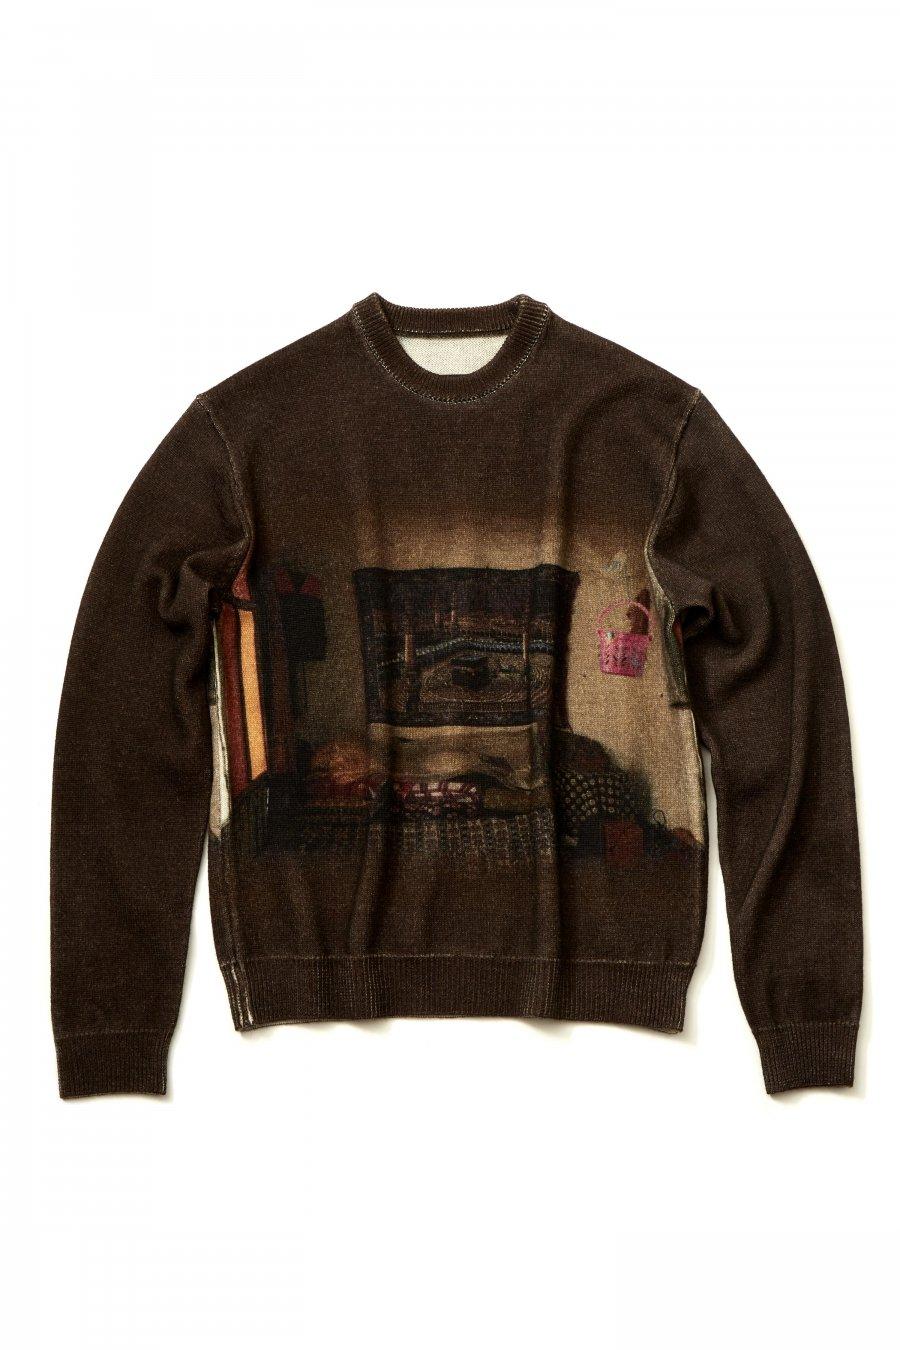 soe  Over Printed Sweater